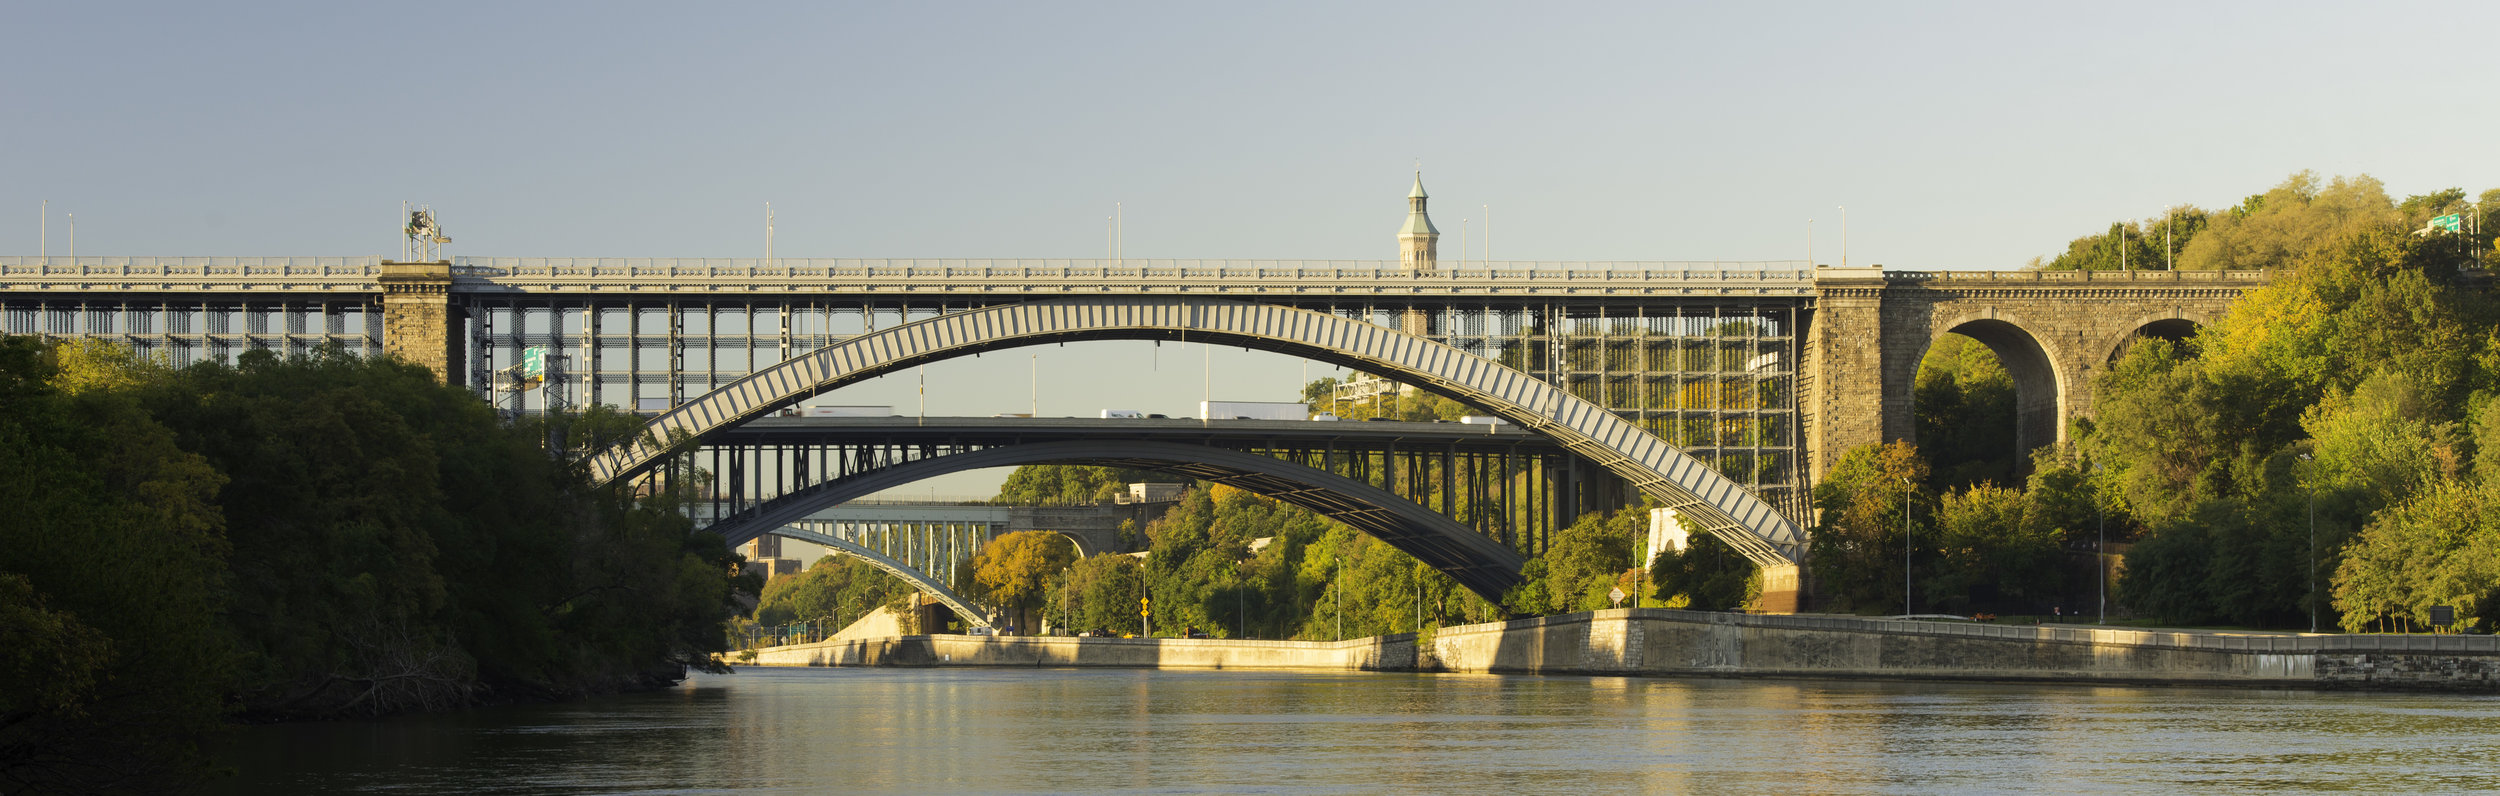 Duane Bailey-Castro Henry Hudson Bridge, 2016 Dibond plexiglass print